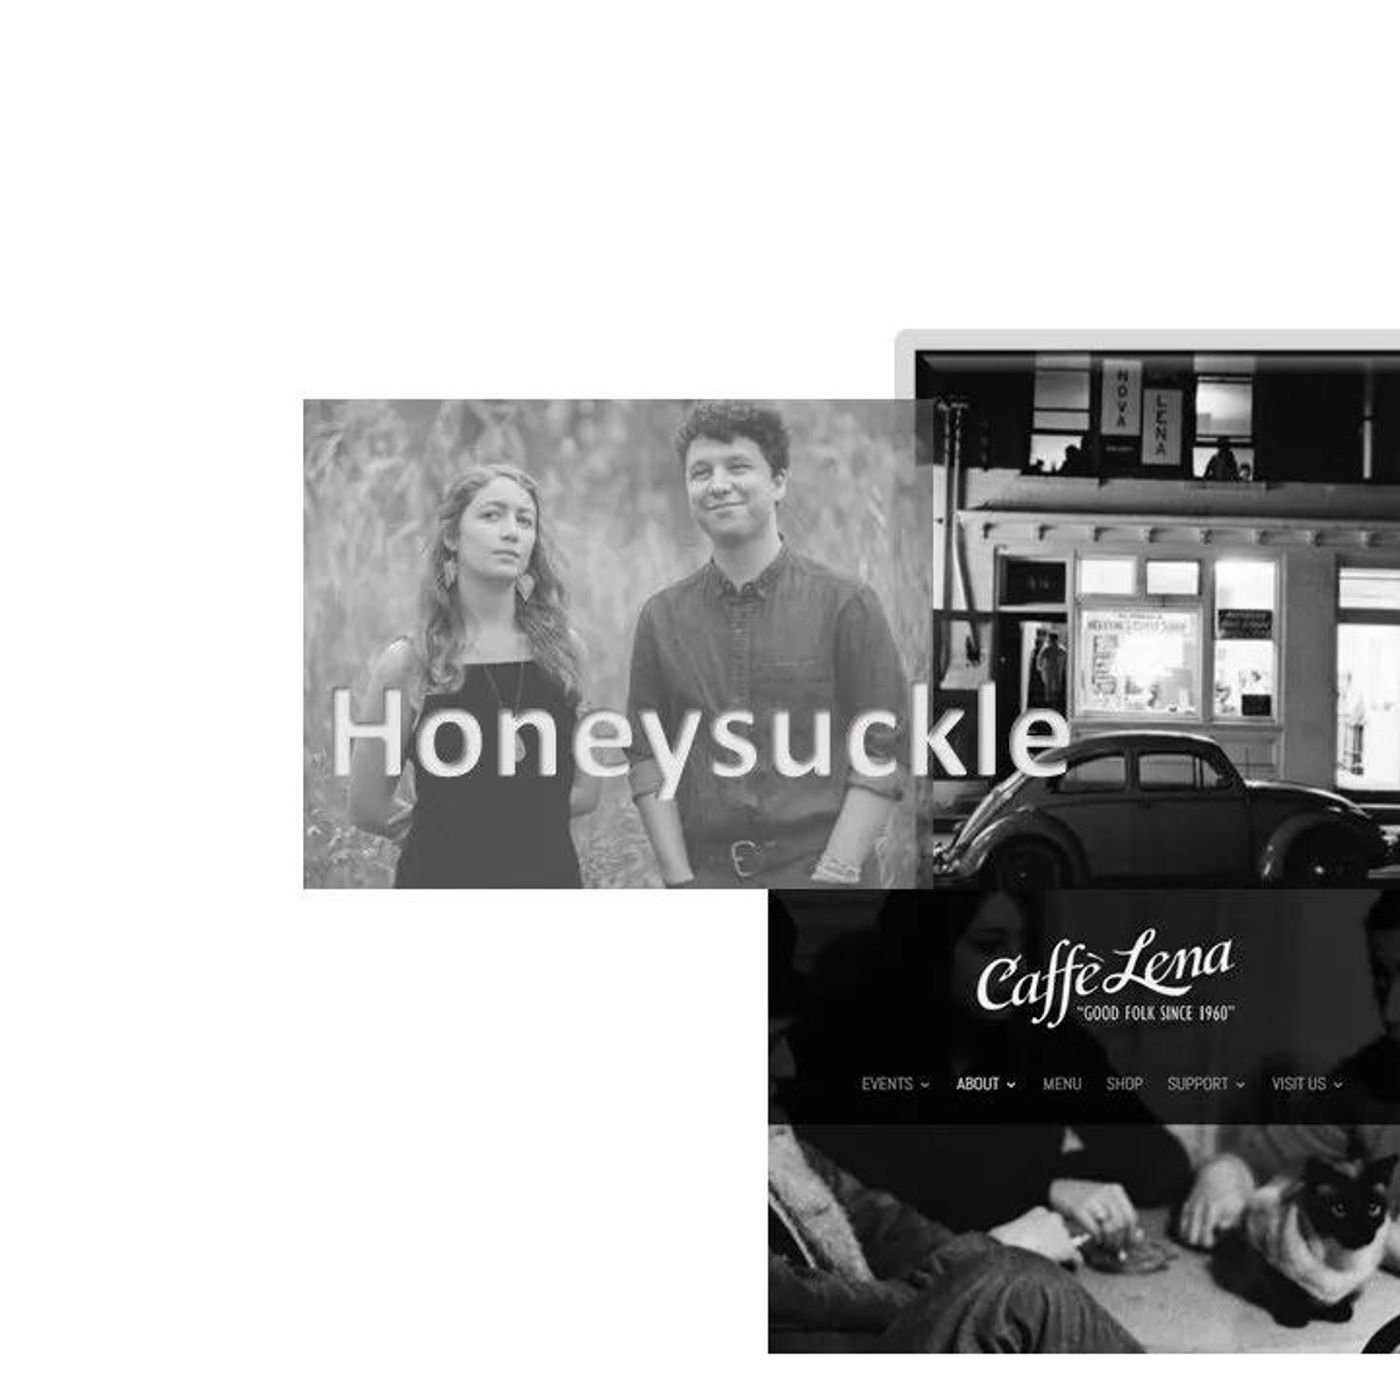 Honeysuckle_With Holly & Chris_Caffe'Lena Performers_4_7_21